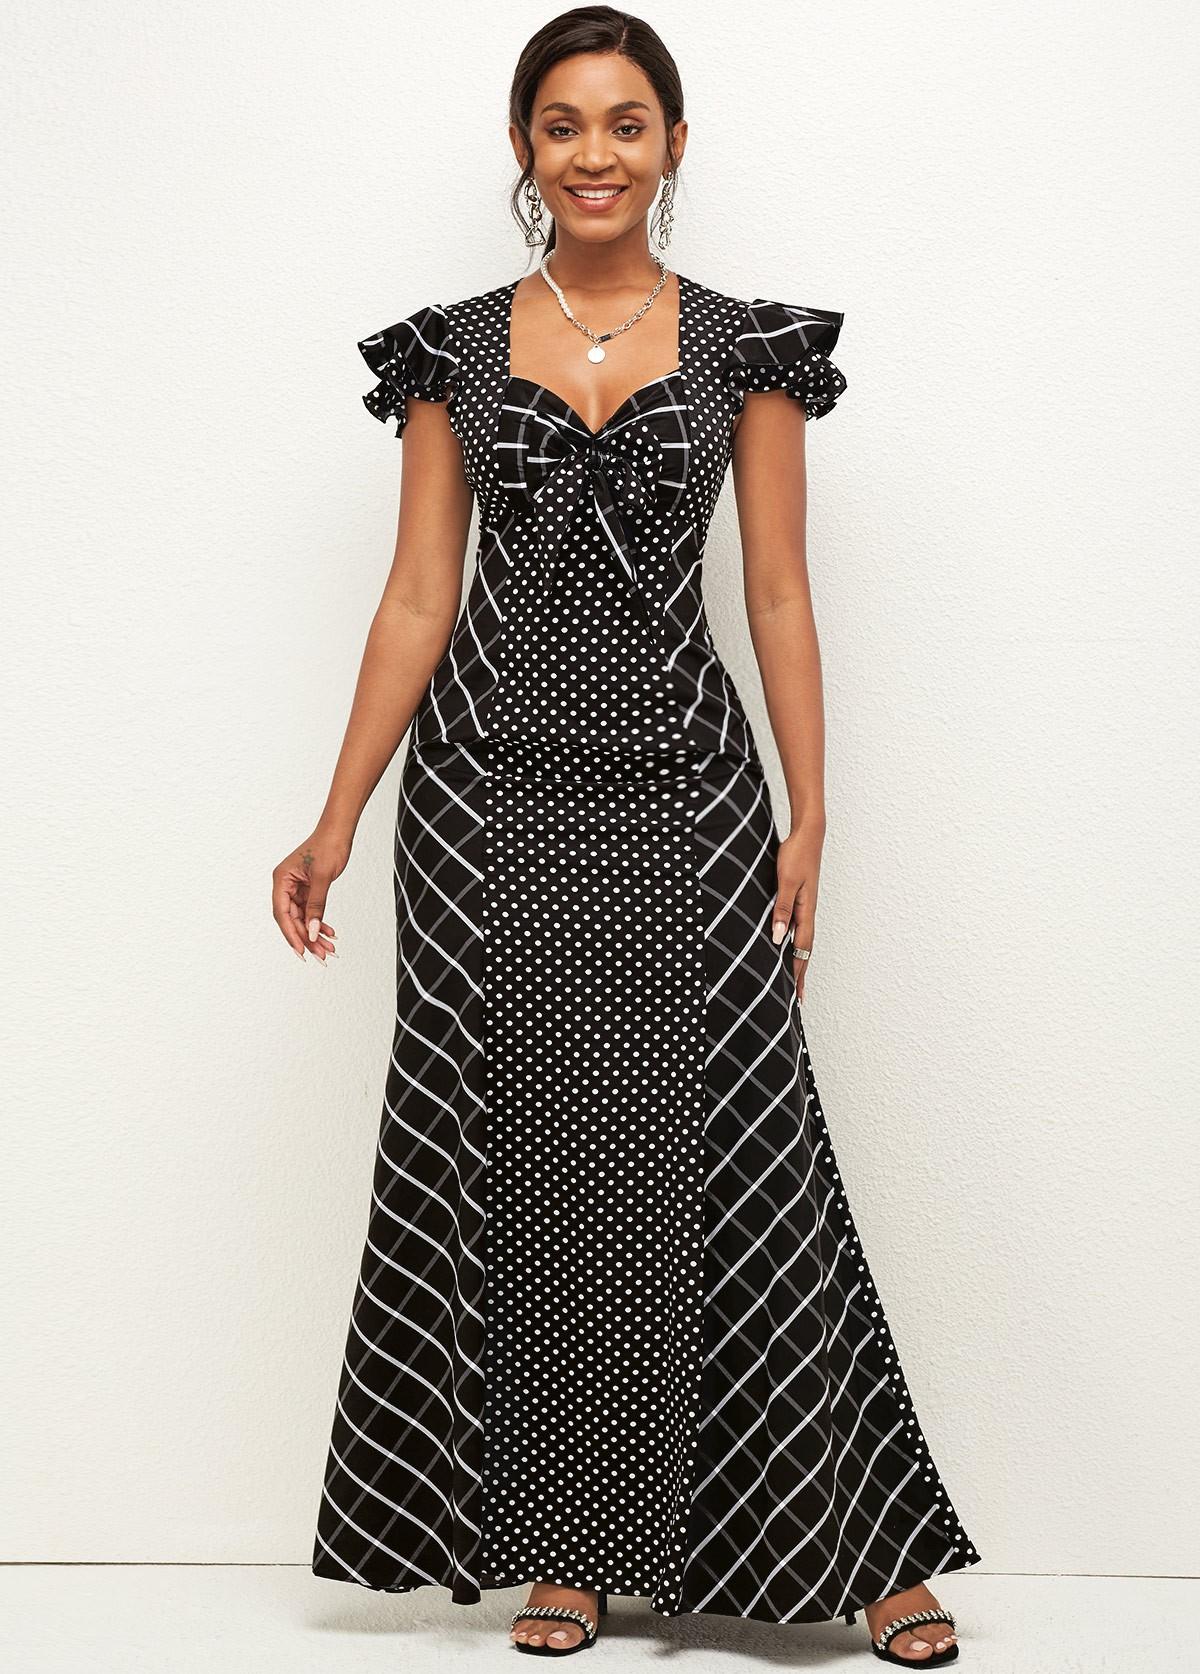 ROTITA Bowknot Polka Dot Sweetheart Neckline Dress